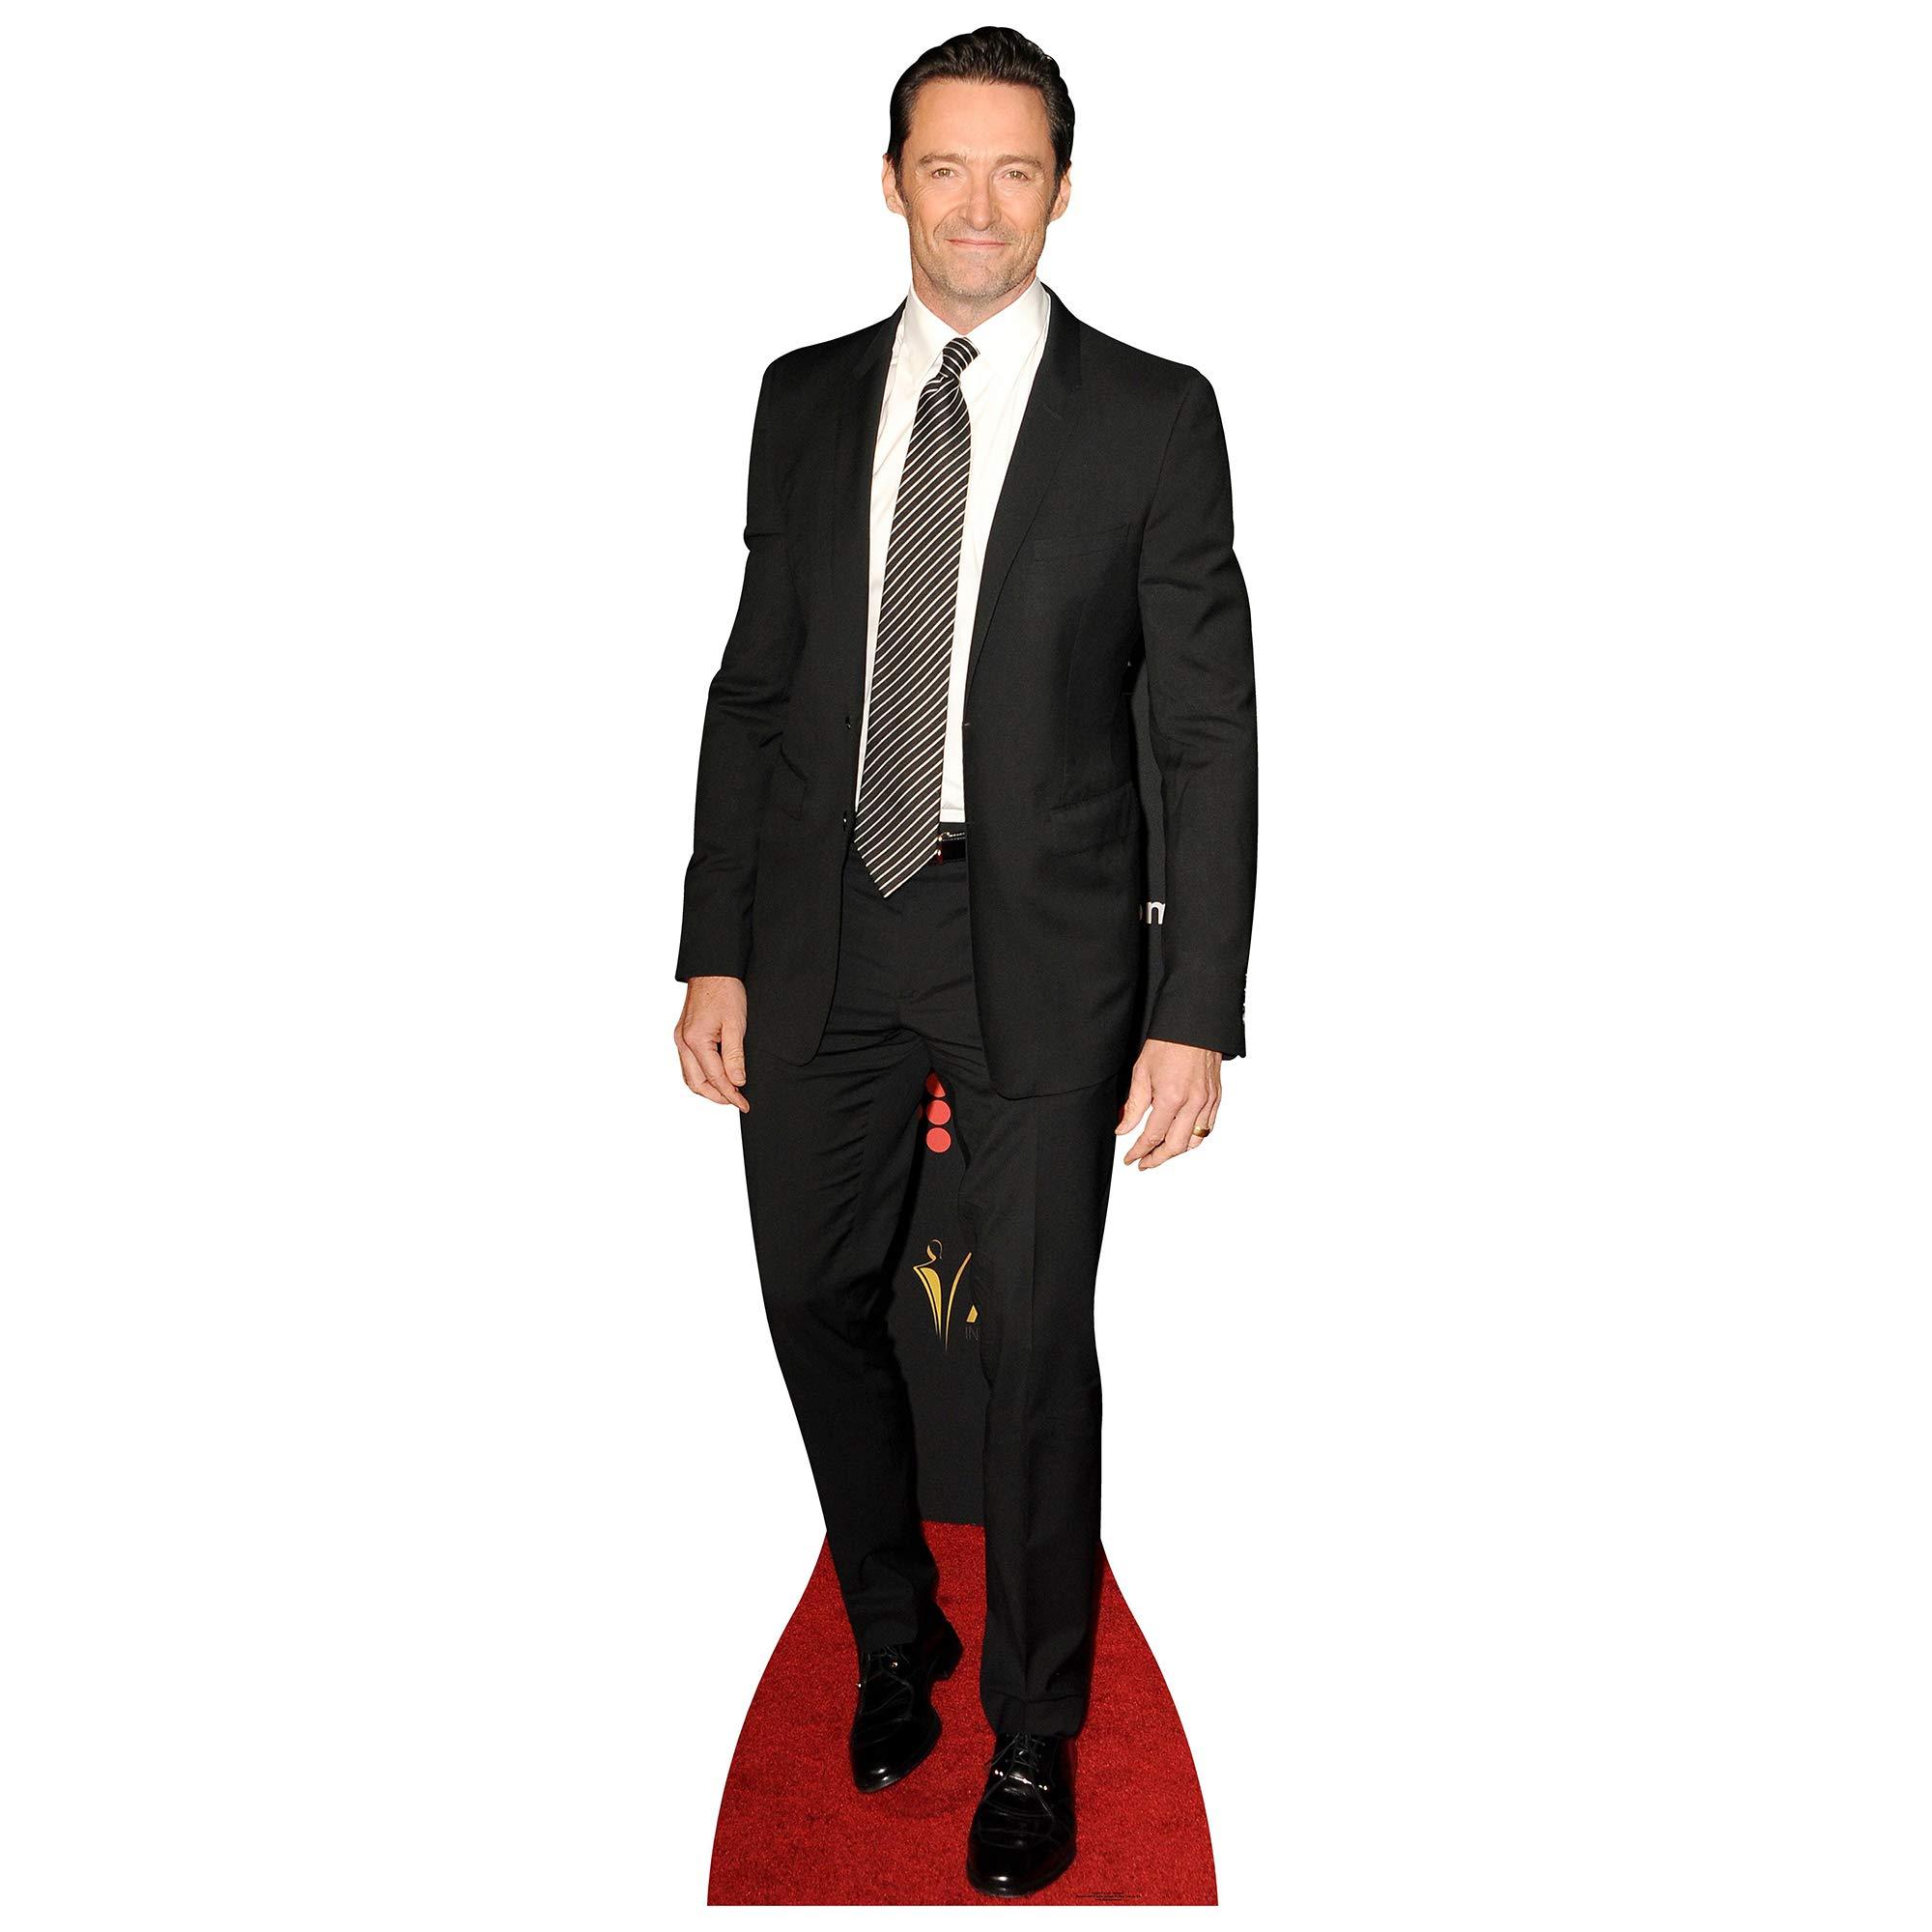 SC2075 Hugh Jackman Cardboard Cutout Standup by Star Cutouts LLC (Image #1)